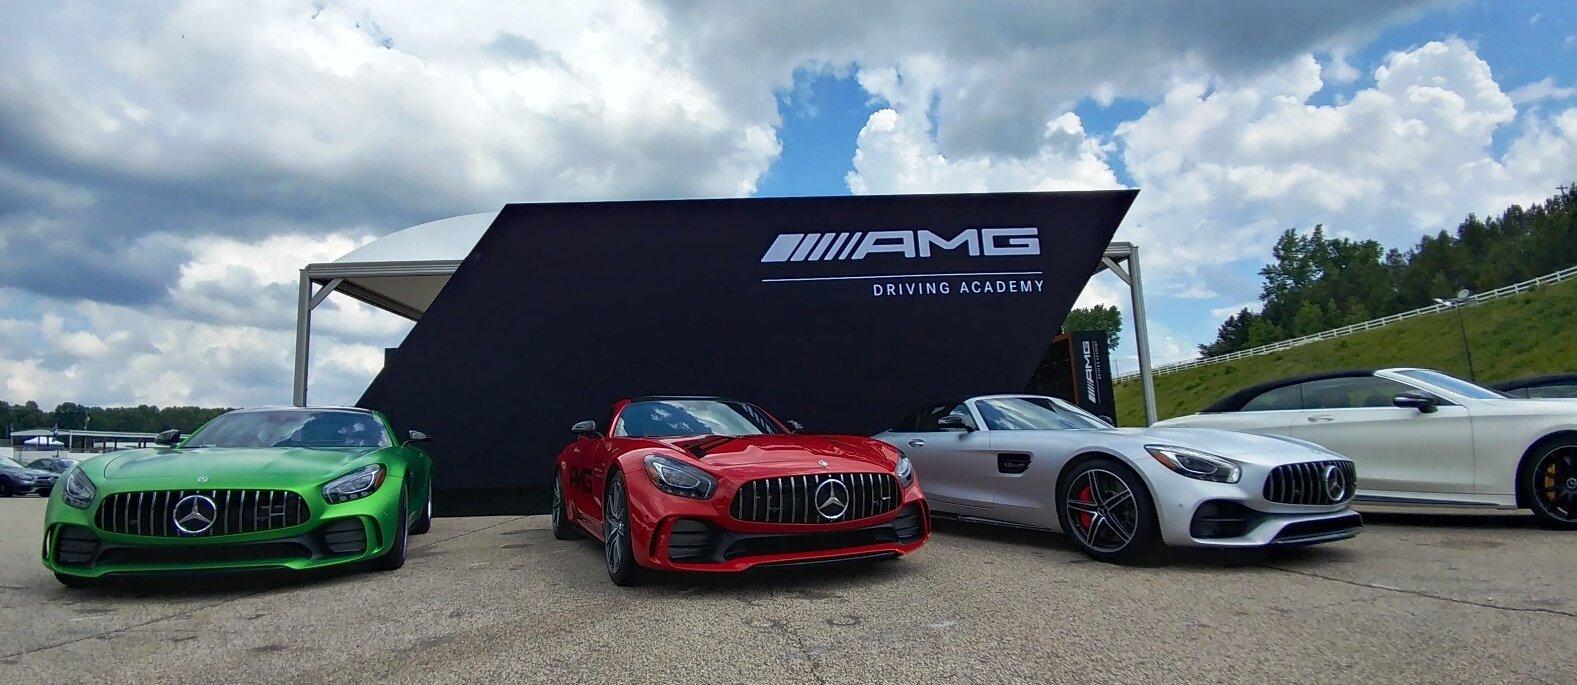 AMG-Driving-Academy-GTC.jpg